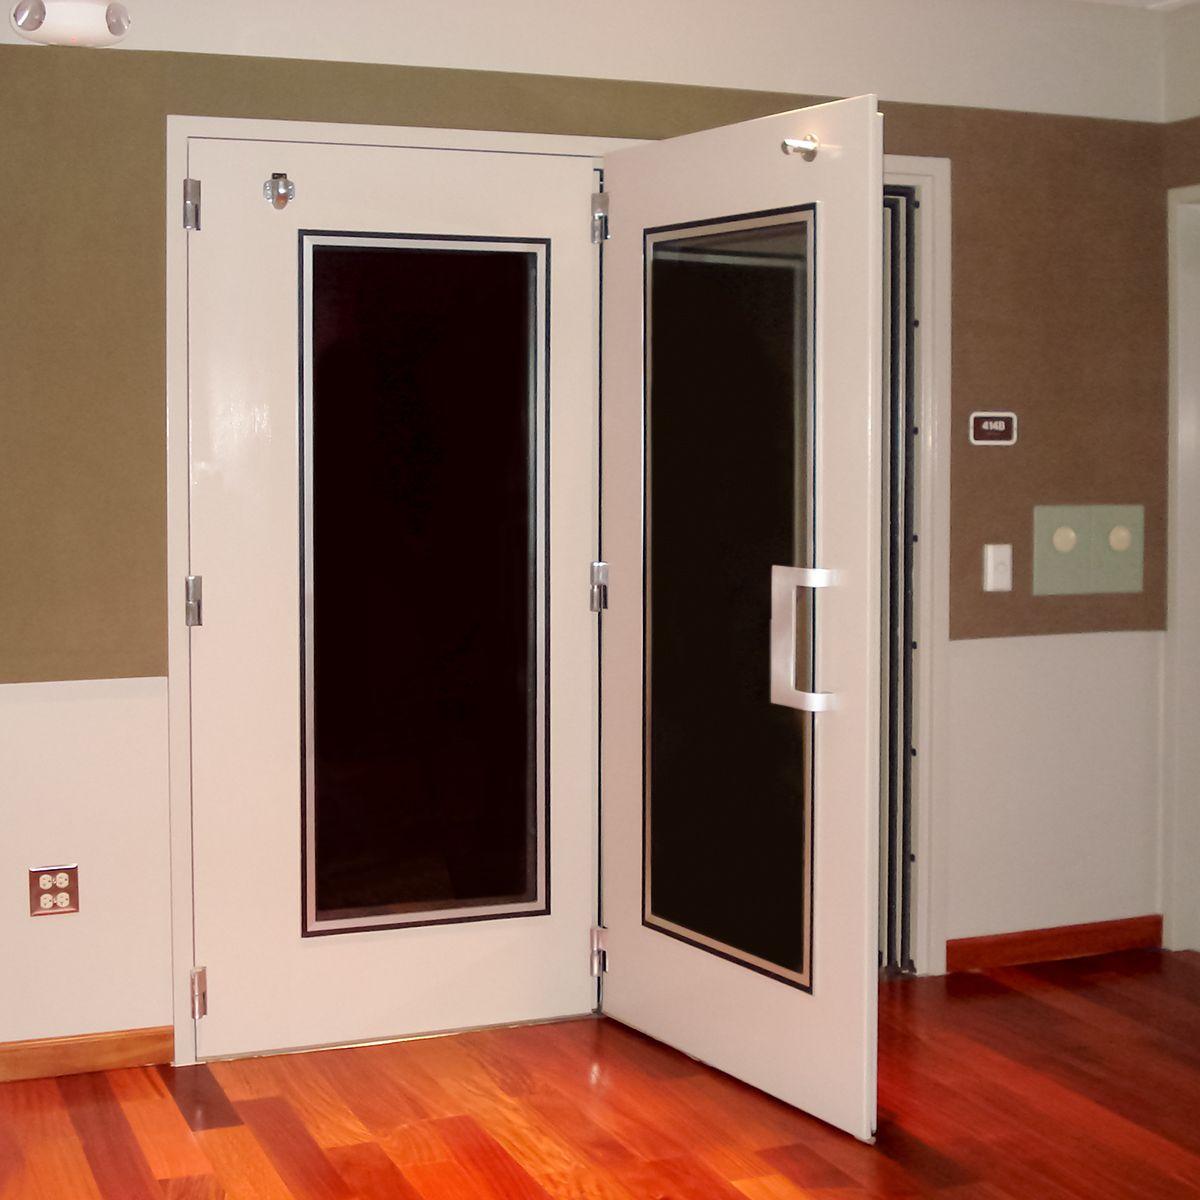 High Quality IAC Acoustics Noise Lock® Door | Acoustical Solutions. Sound Isolation Acoustic